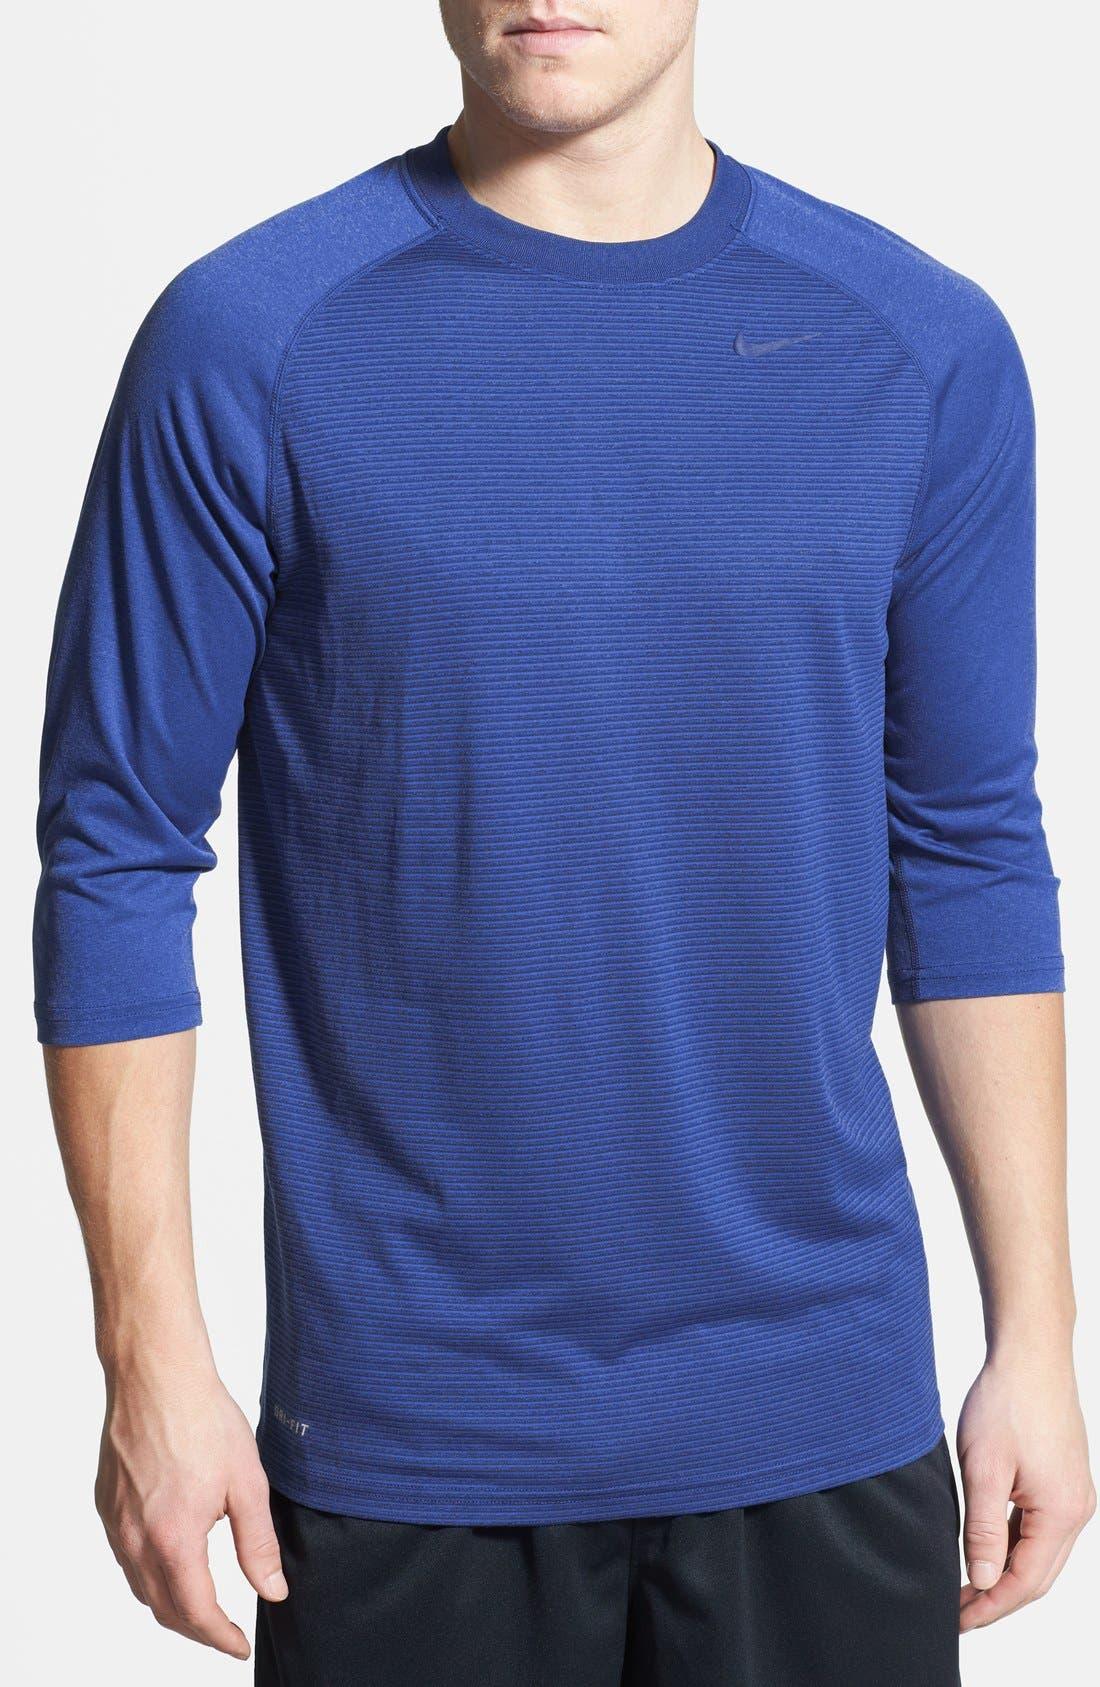 Main Image - Nike Dri-FIT Three Quarter Length Raglan Sleeve T-Shirt